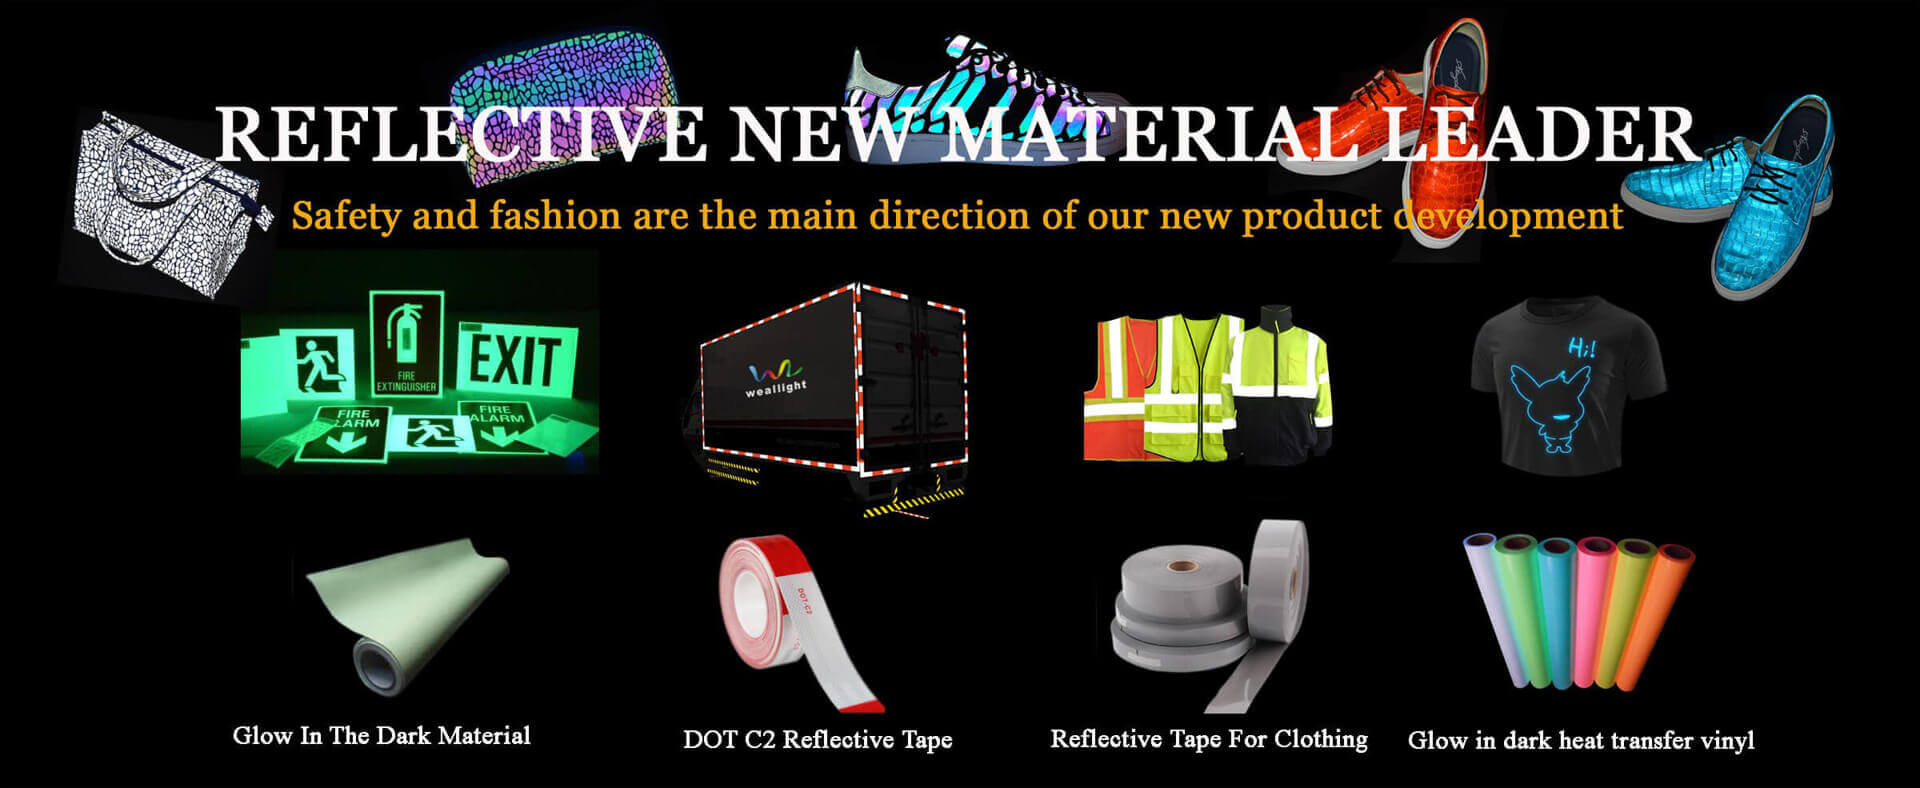 Luminous/ Reflective Tape Manufacturer (Heat Transfer Vinyl) | Weallight